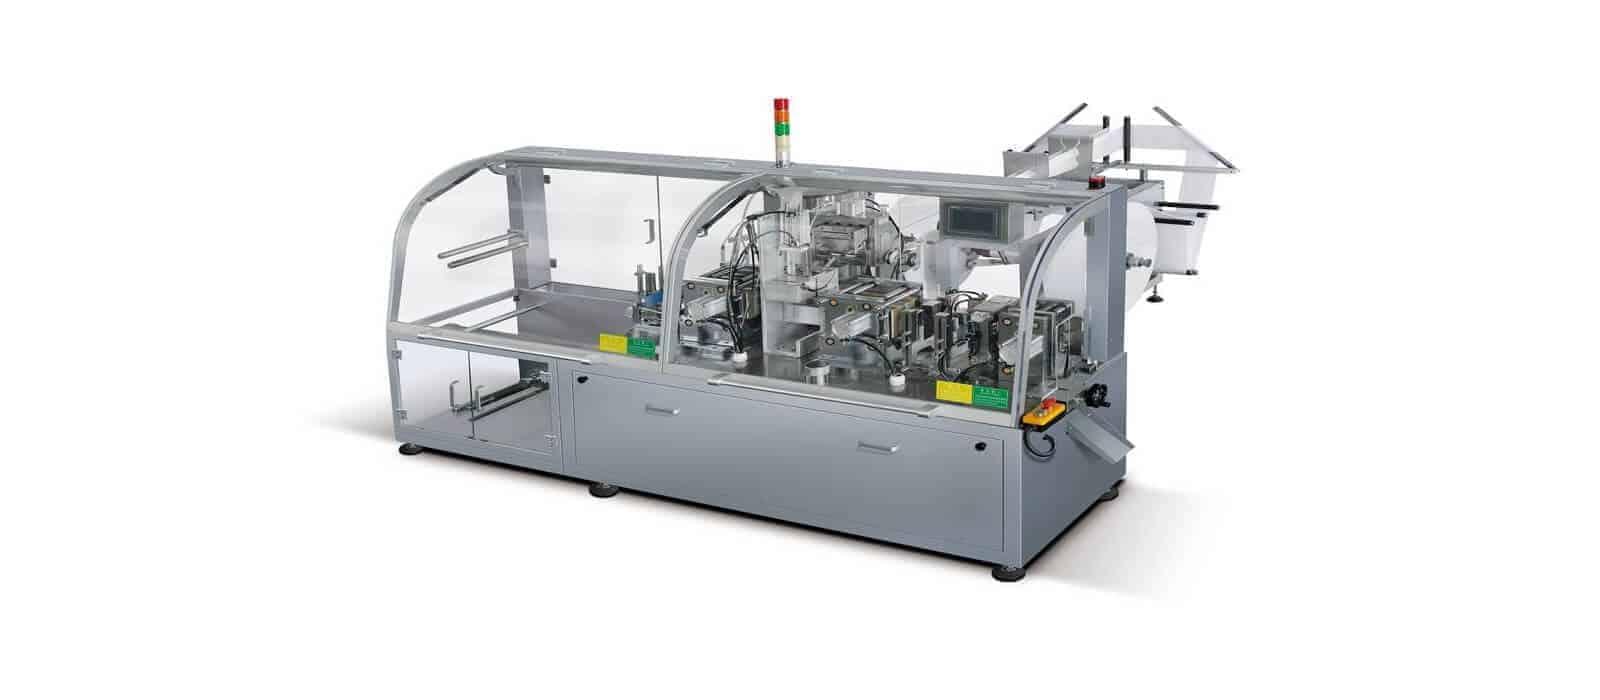 Single wet wipes production line - DH-250 Single wet wipes production line